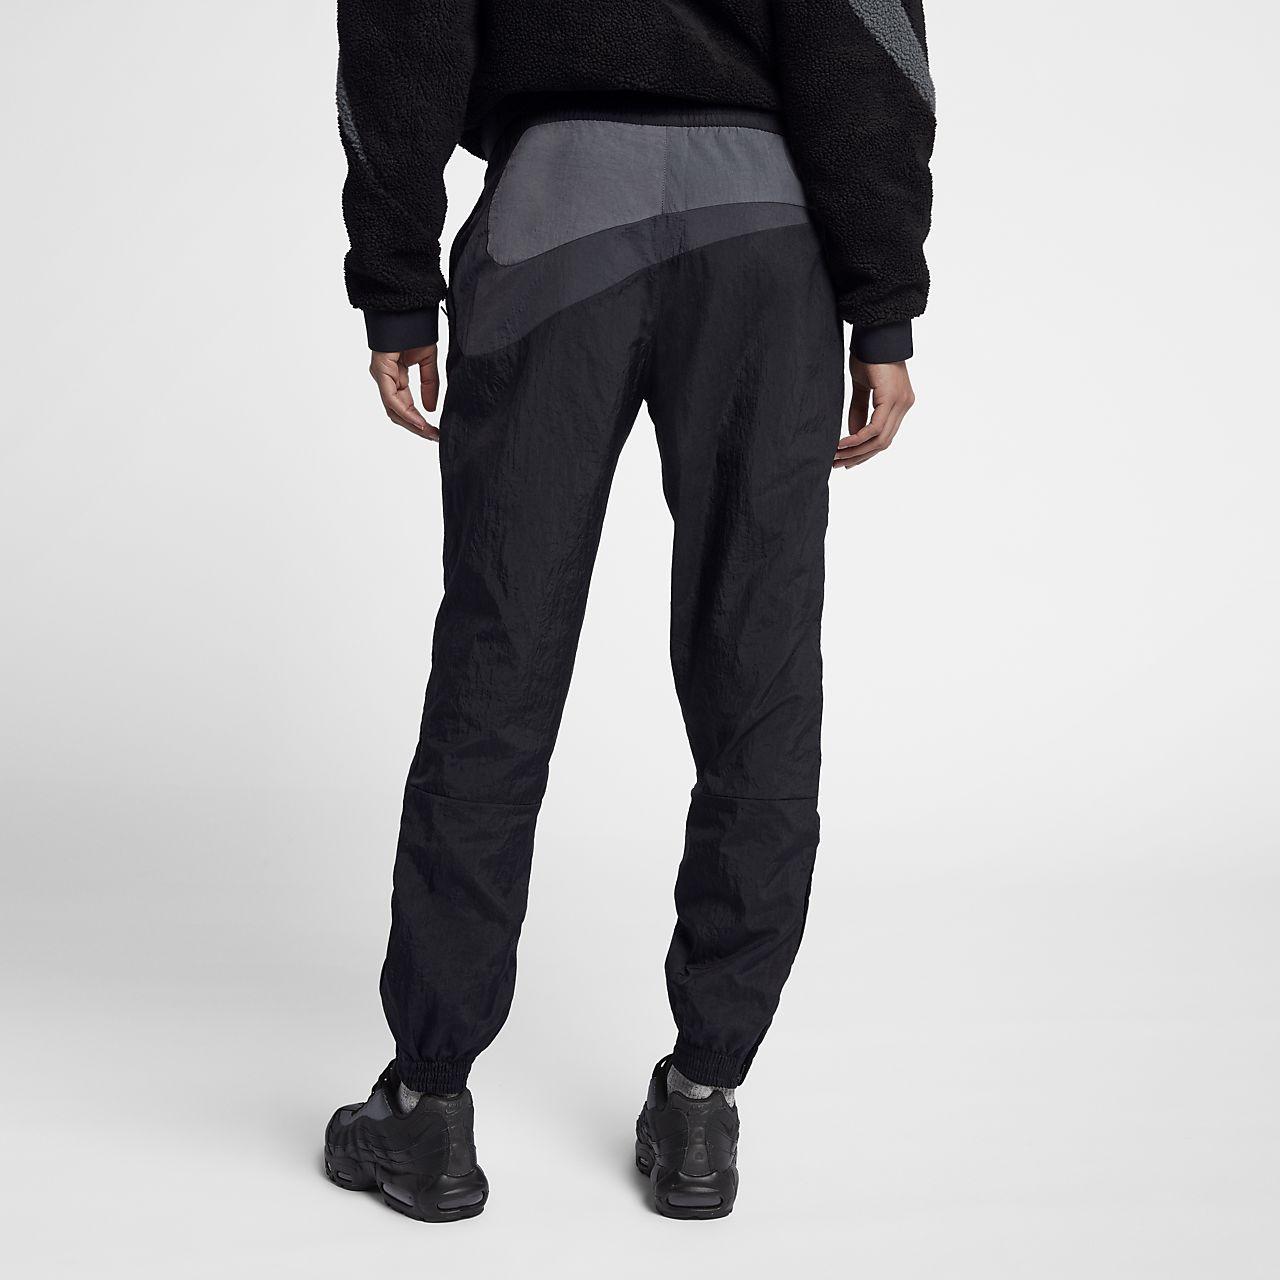 5bb87f0e8c16 Low Resolution Υφαντό παντελόνι φόρμας Nike Sportswear Υφαντό παντελόνι  φόρμας Nike Sportswear